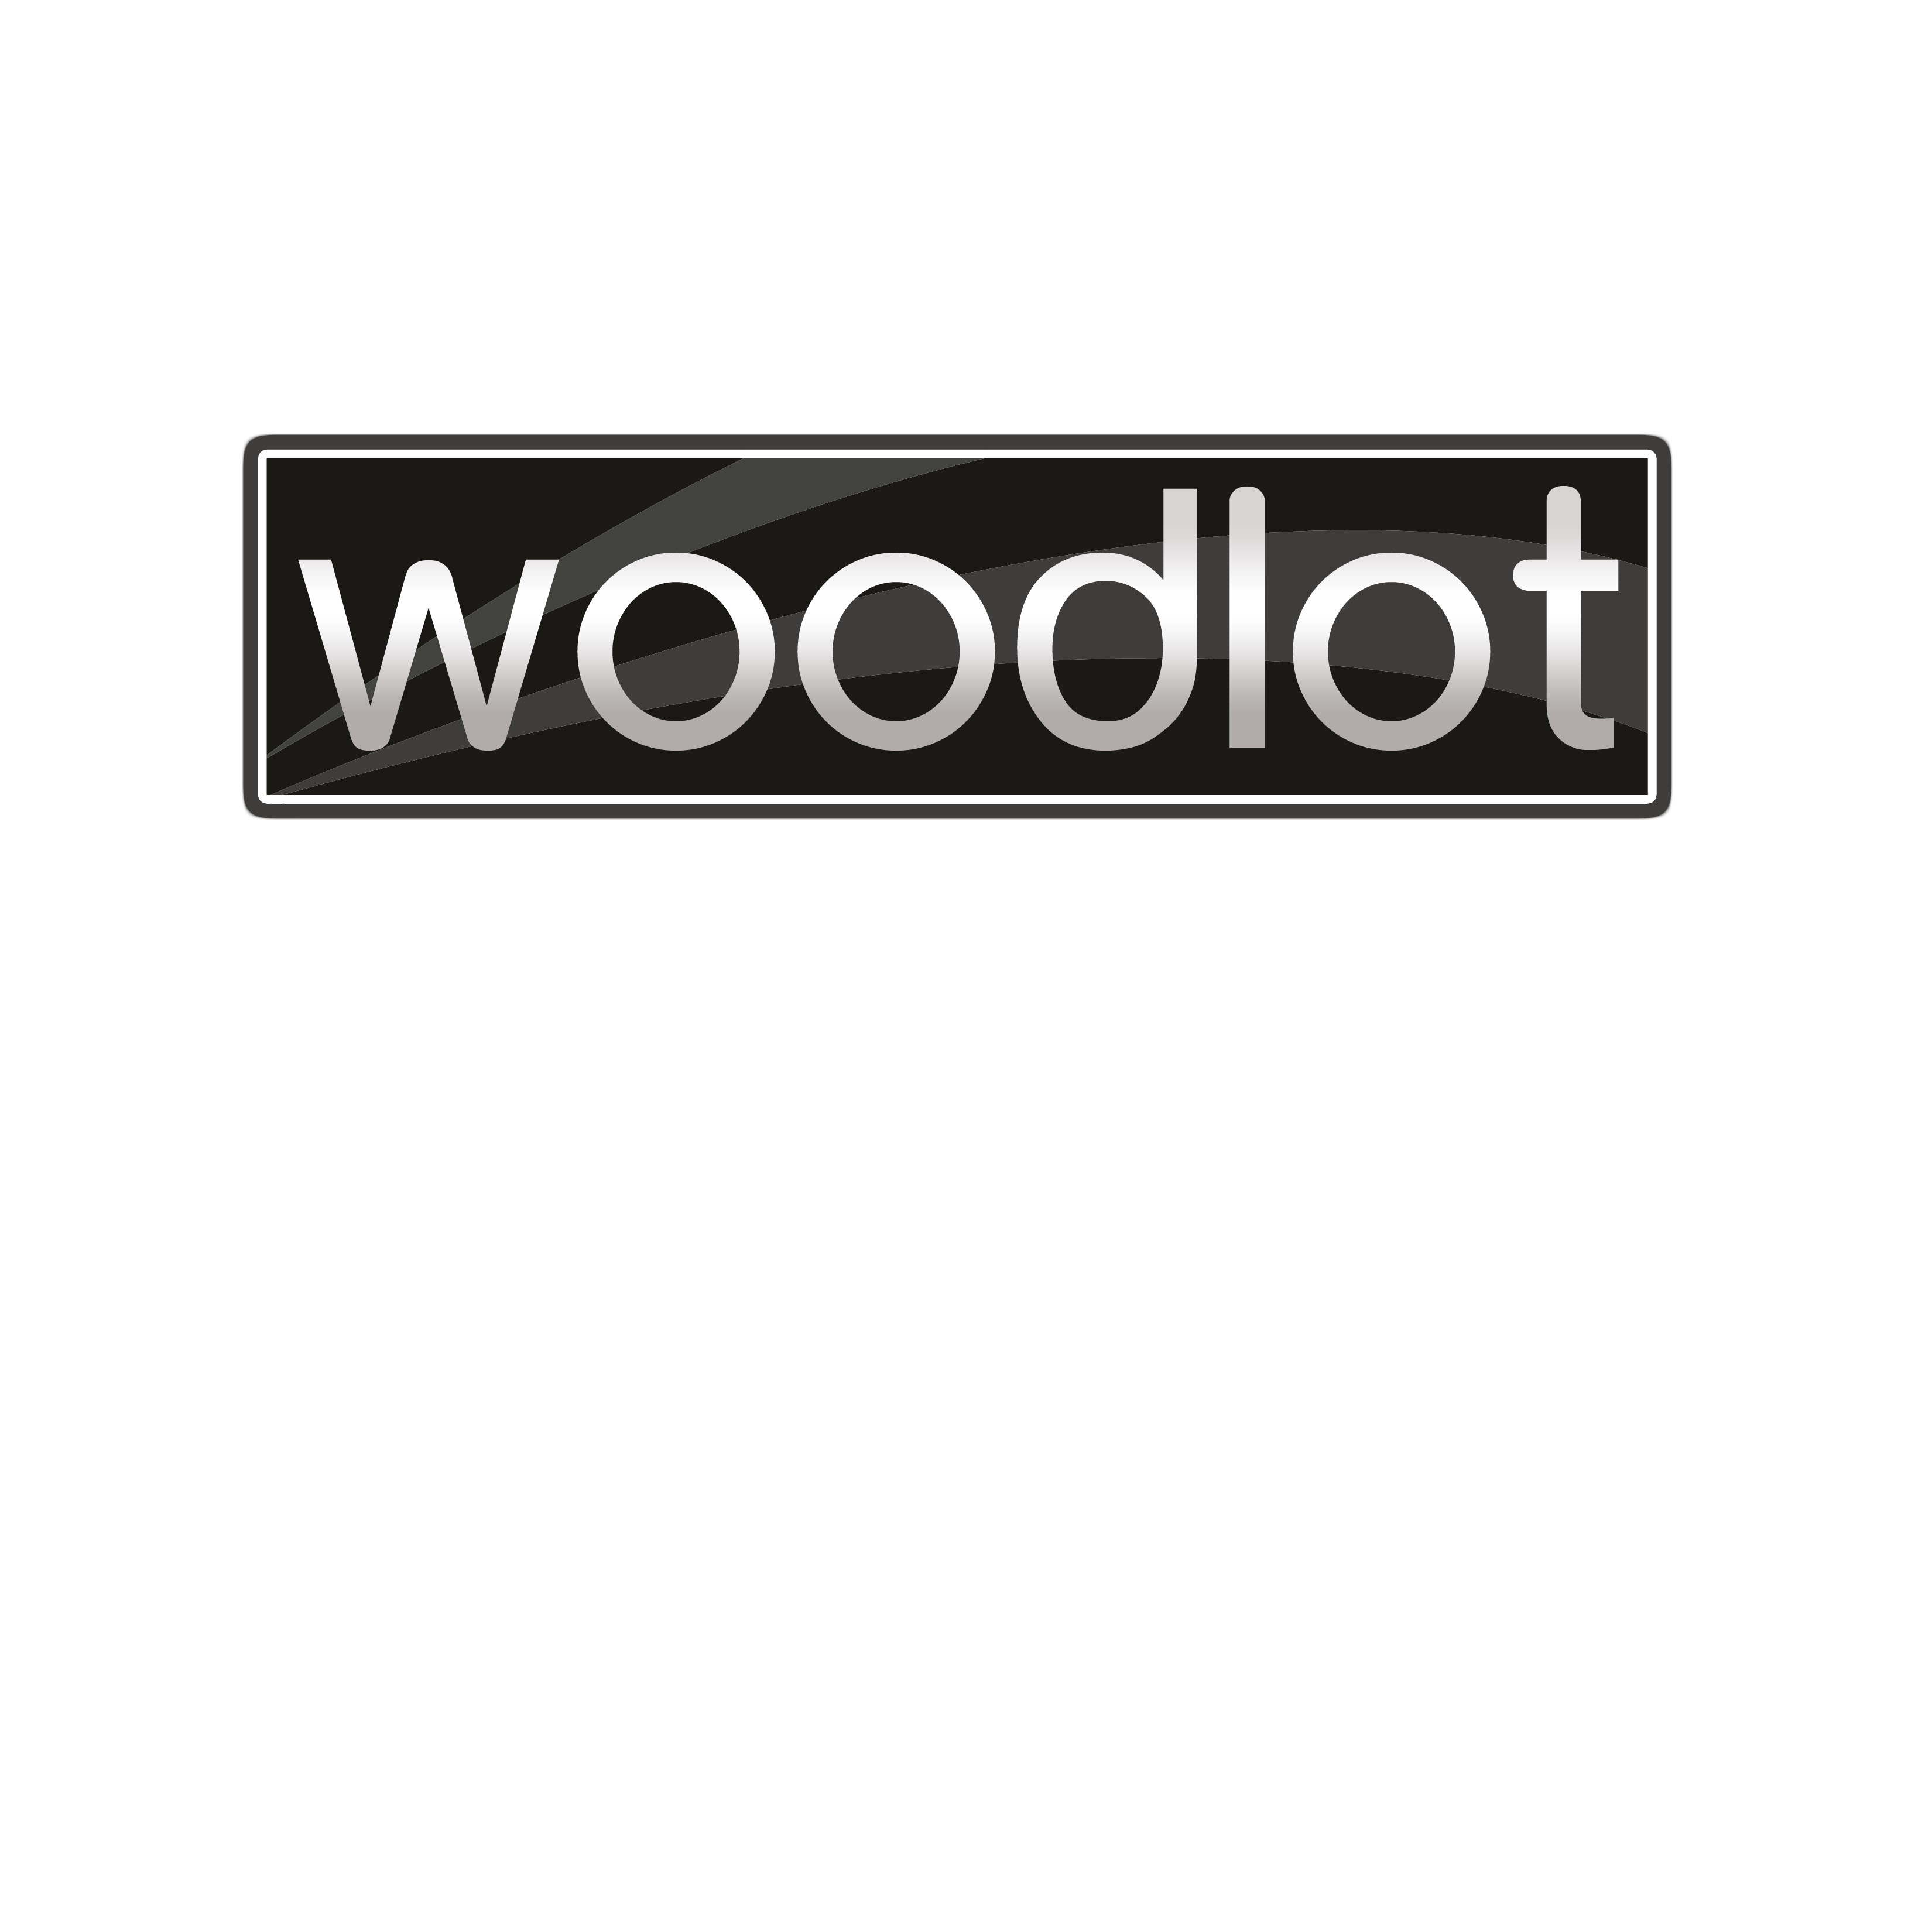 Logo Design by Allan Esclamado - Entry No. 12 in the Logo Design Contest Fun Logo Design for woodlot.